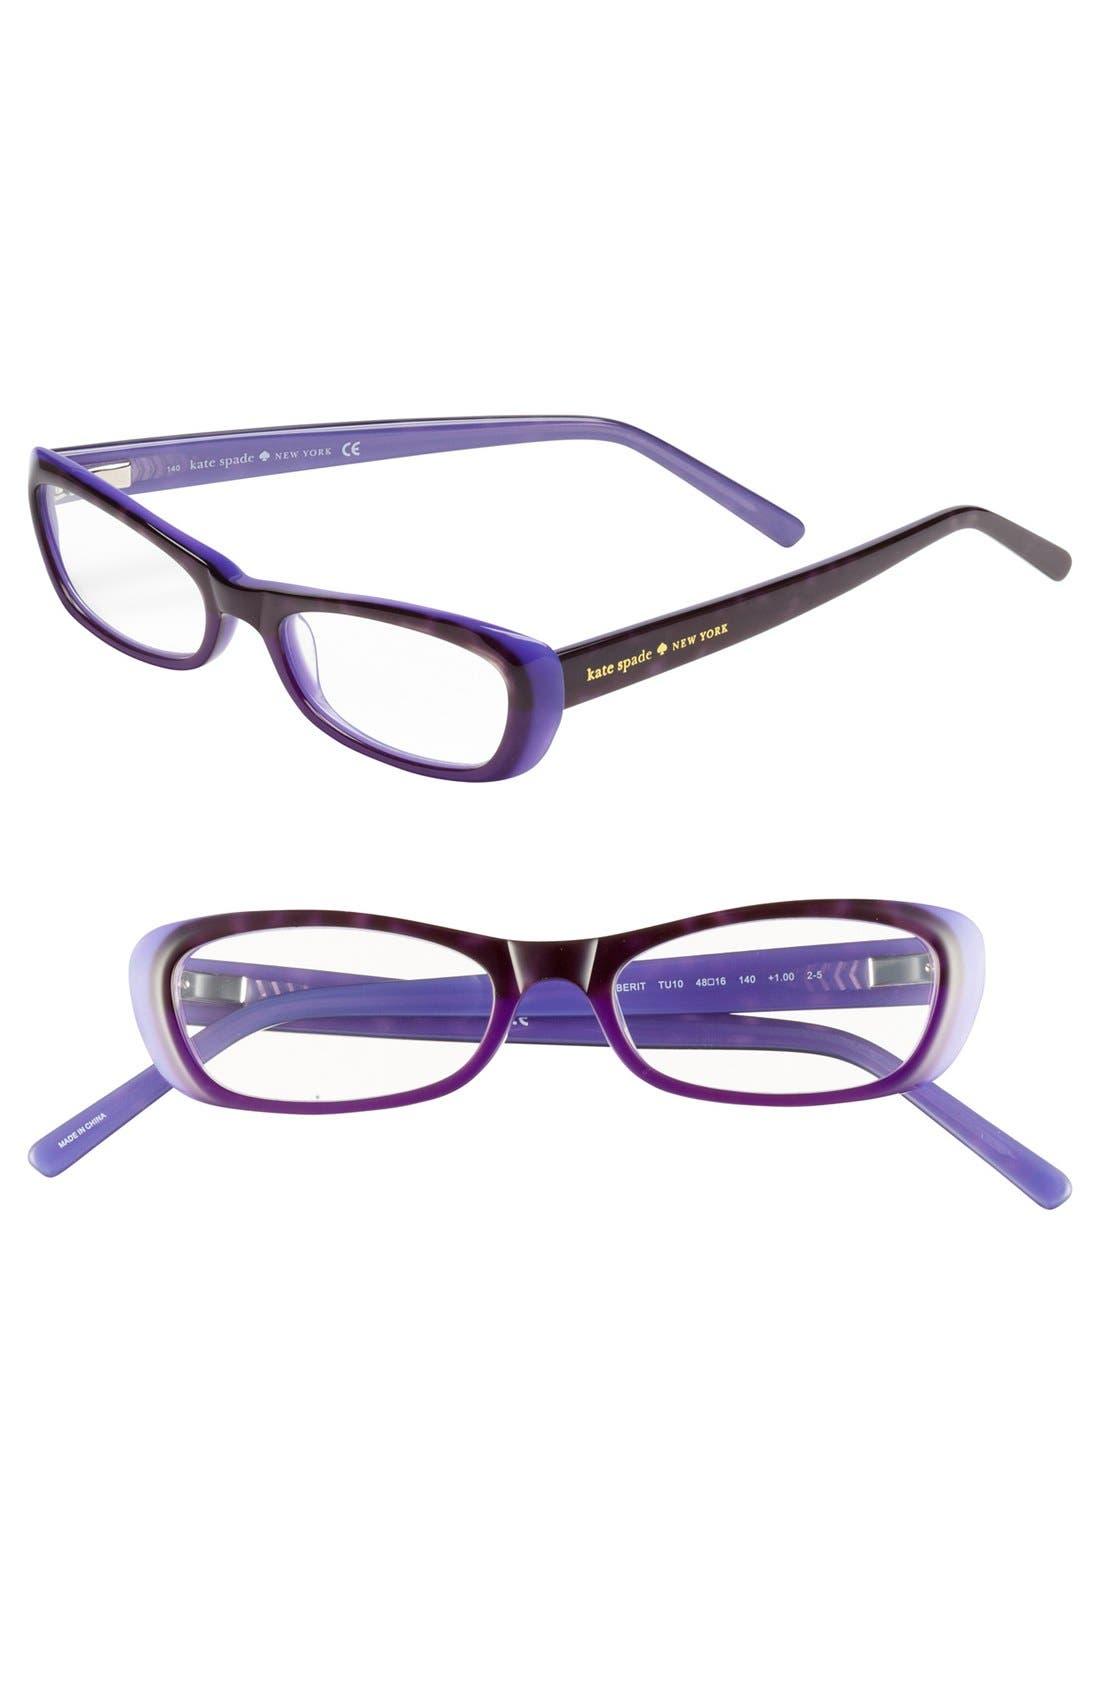 Alternate Image 1 Selected - kate spade new york 'berit' reading glasses (Online Only)